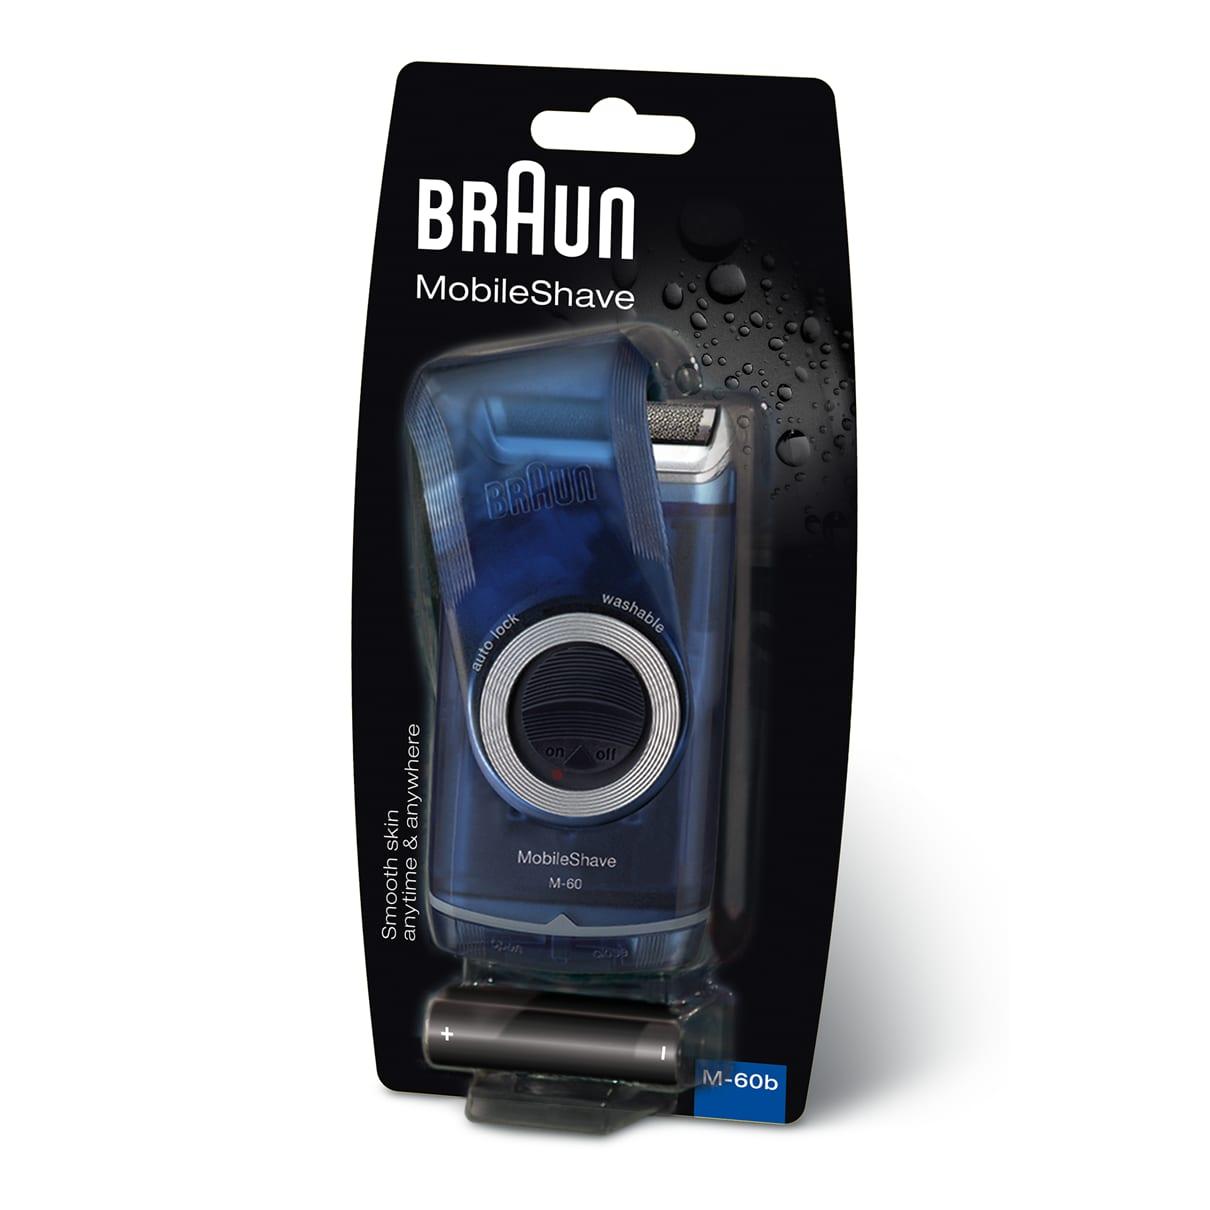 Braun MobileShave M-60 Portable Mens Shaver  (Transparent Blue)